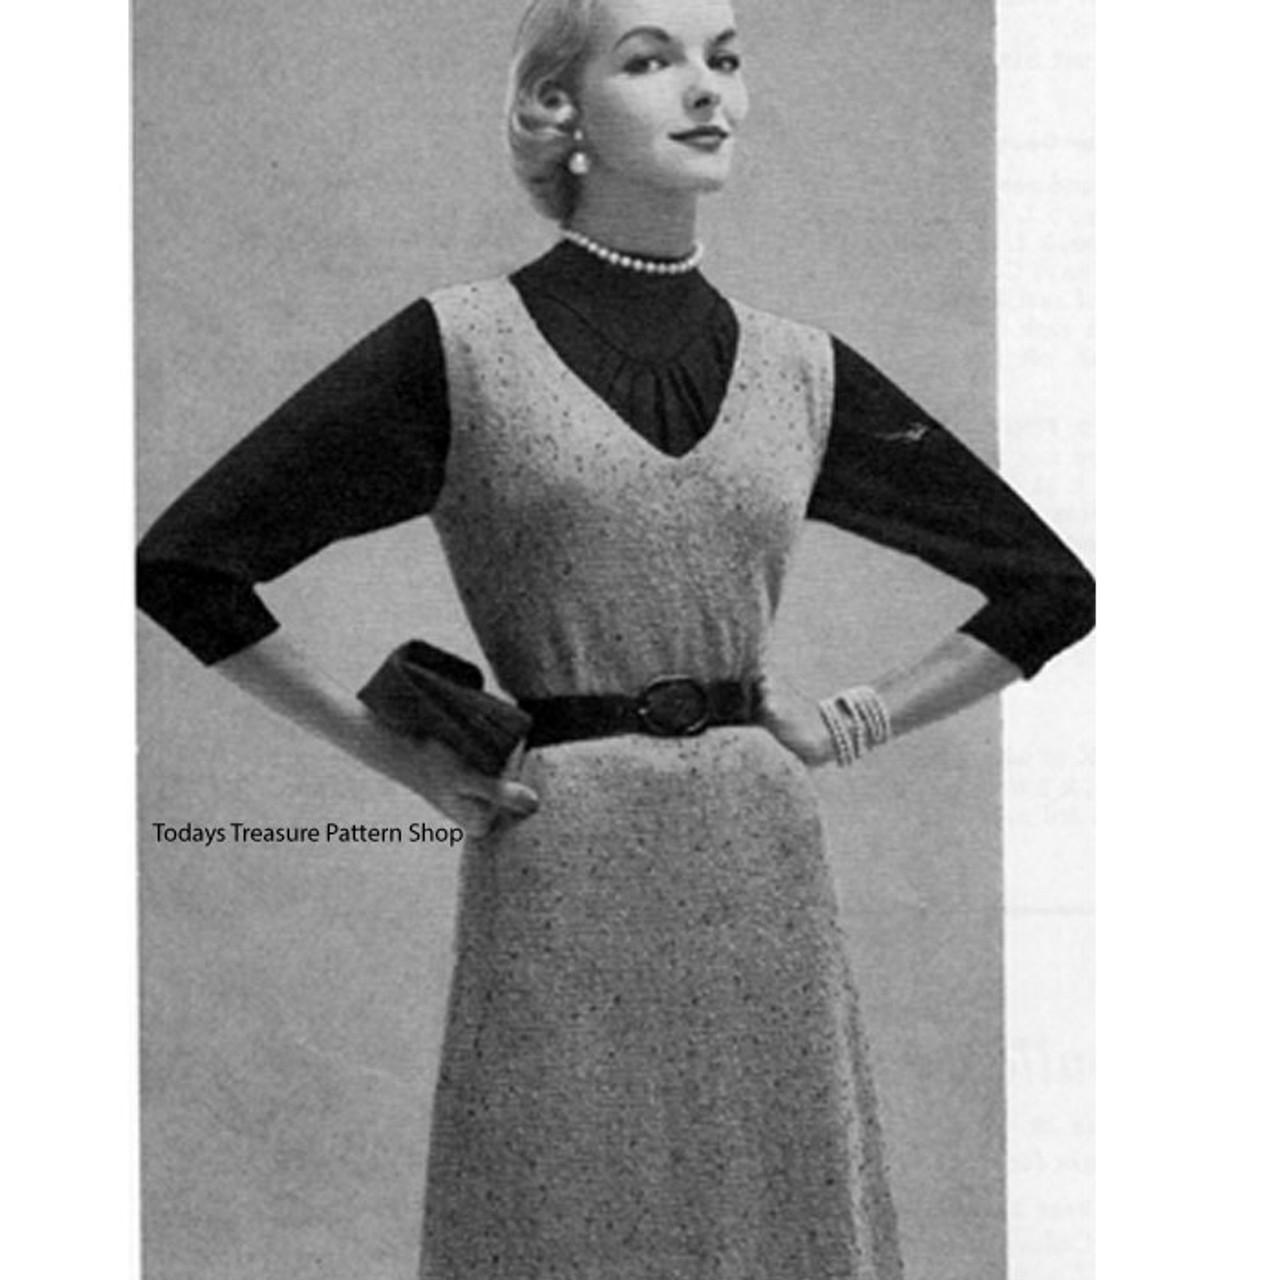 Vintage 1950s Knitted Jumper Pattern with V-Neck